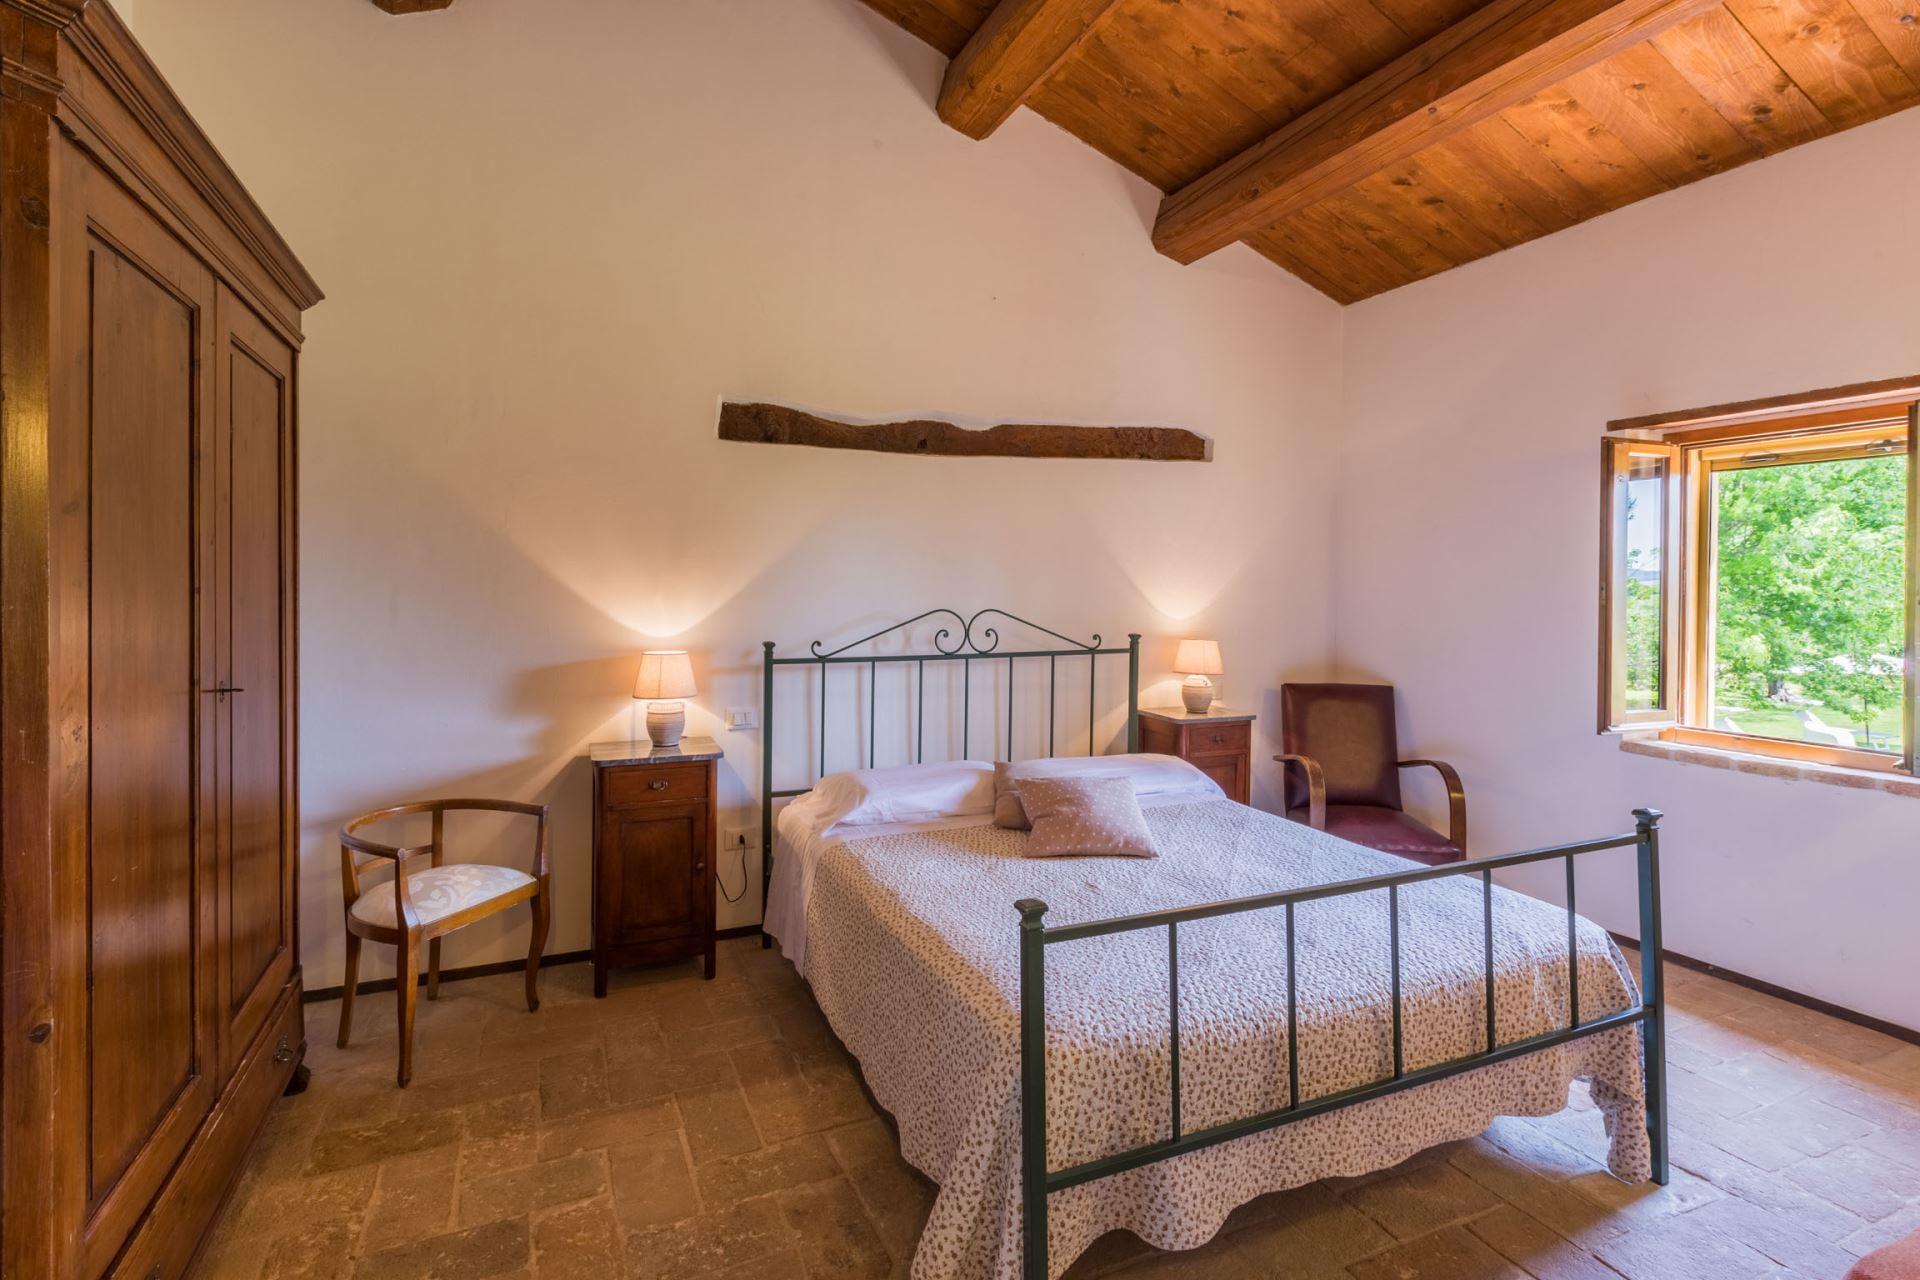 Ferienhaus VILLA DELLE VIGNE (2129909), Pesaro, Pesaro und Urbino, Marken, Italien, Bild 11